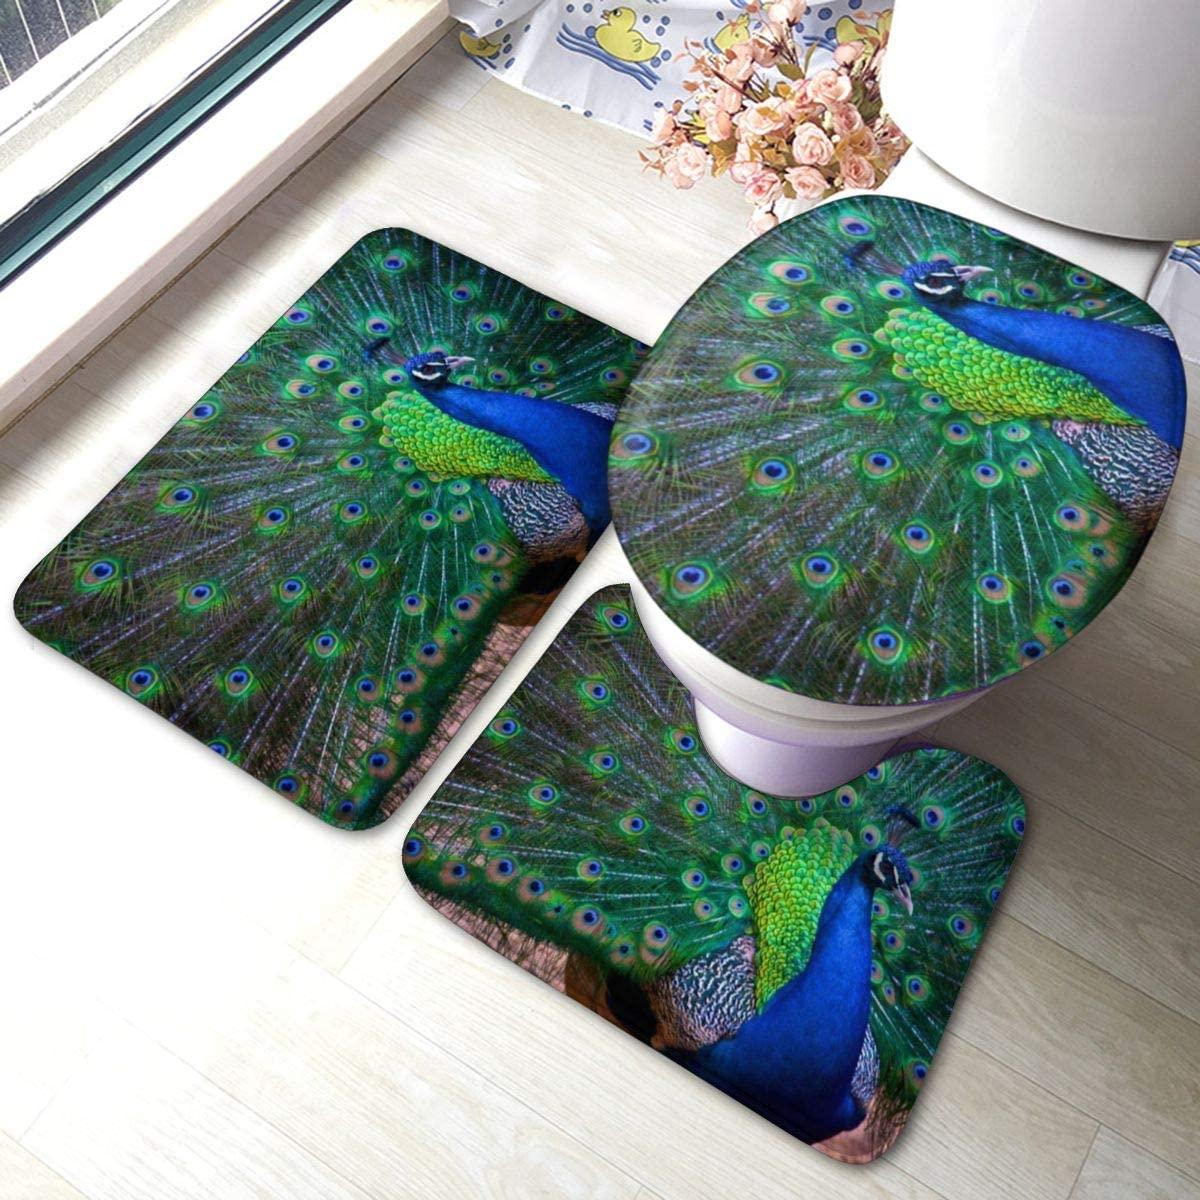 Beautiful Peacock Bathroom Rugs Set 3 Piece Anti-Skid Pads Bath Mat +U-Shaped Contour + Toilet Lid Cover Bath Rug Set